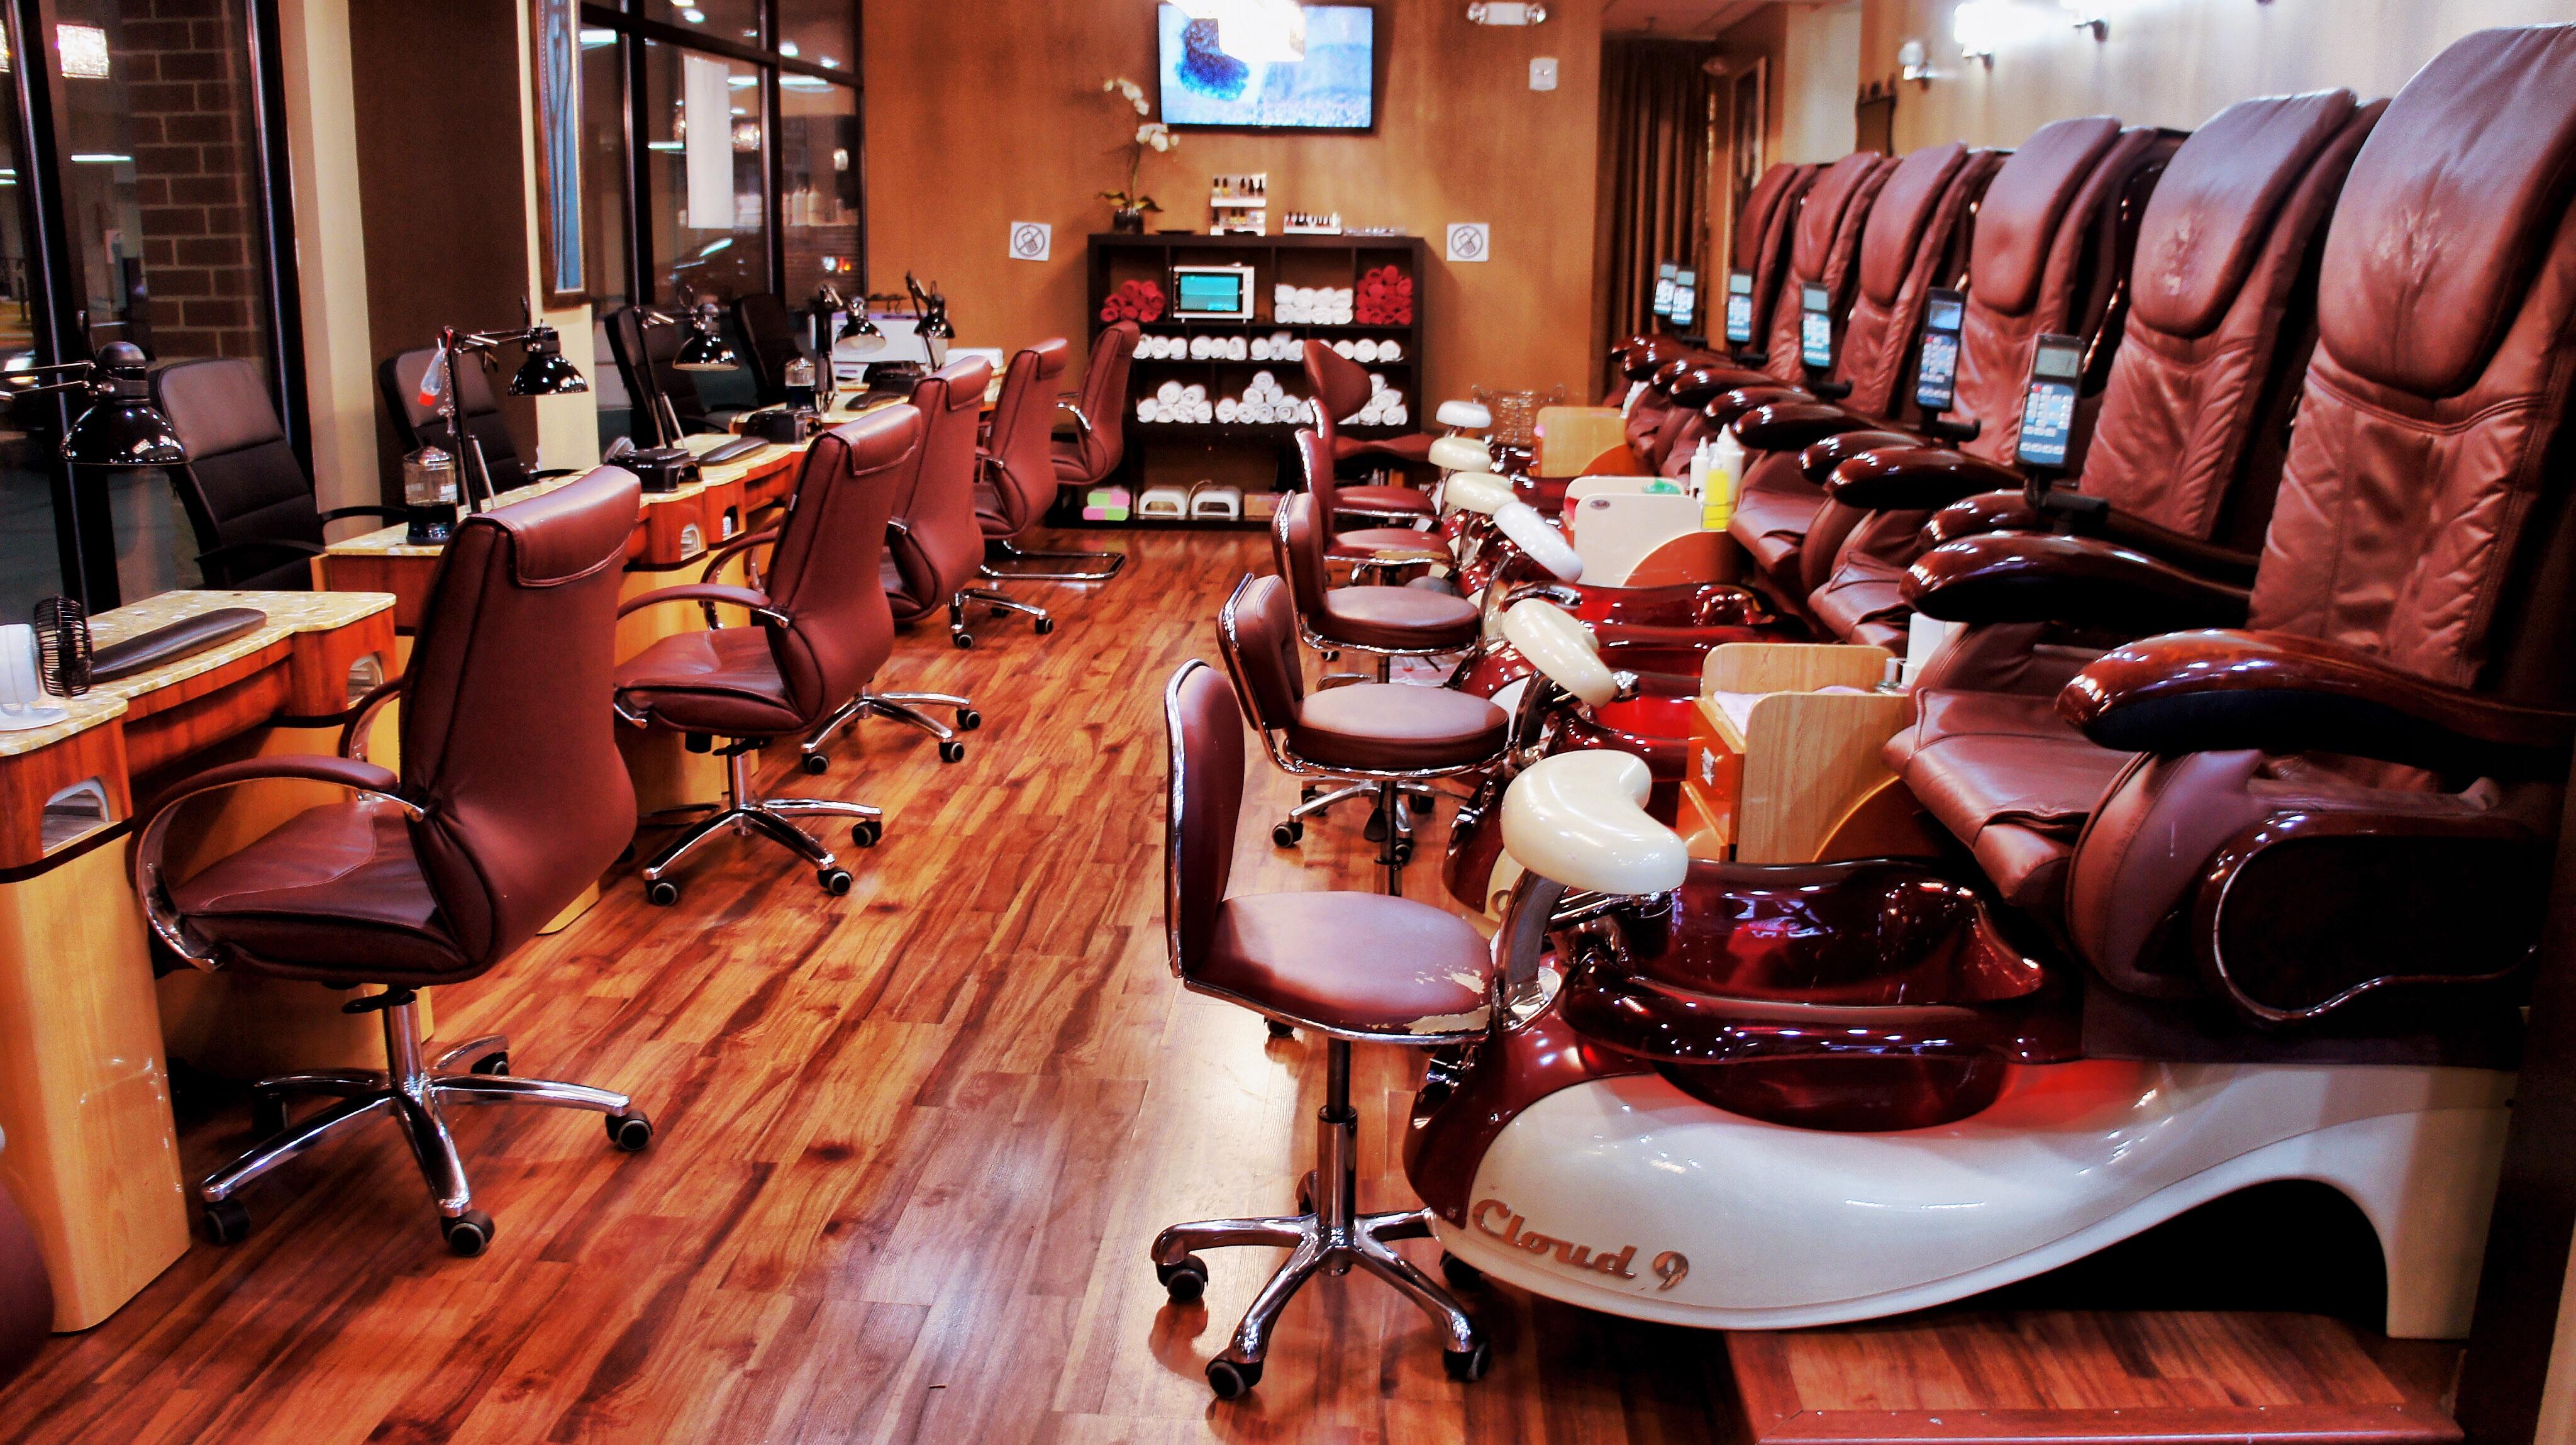 Mancini de Paris Salon and Day Spa